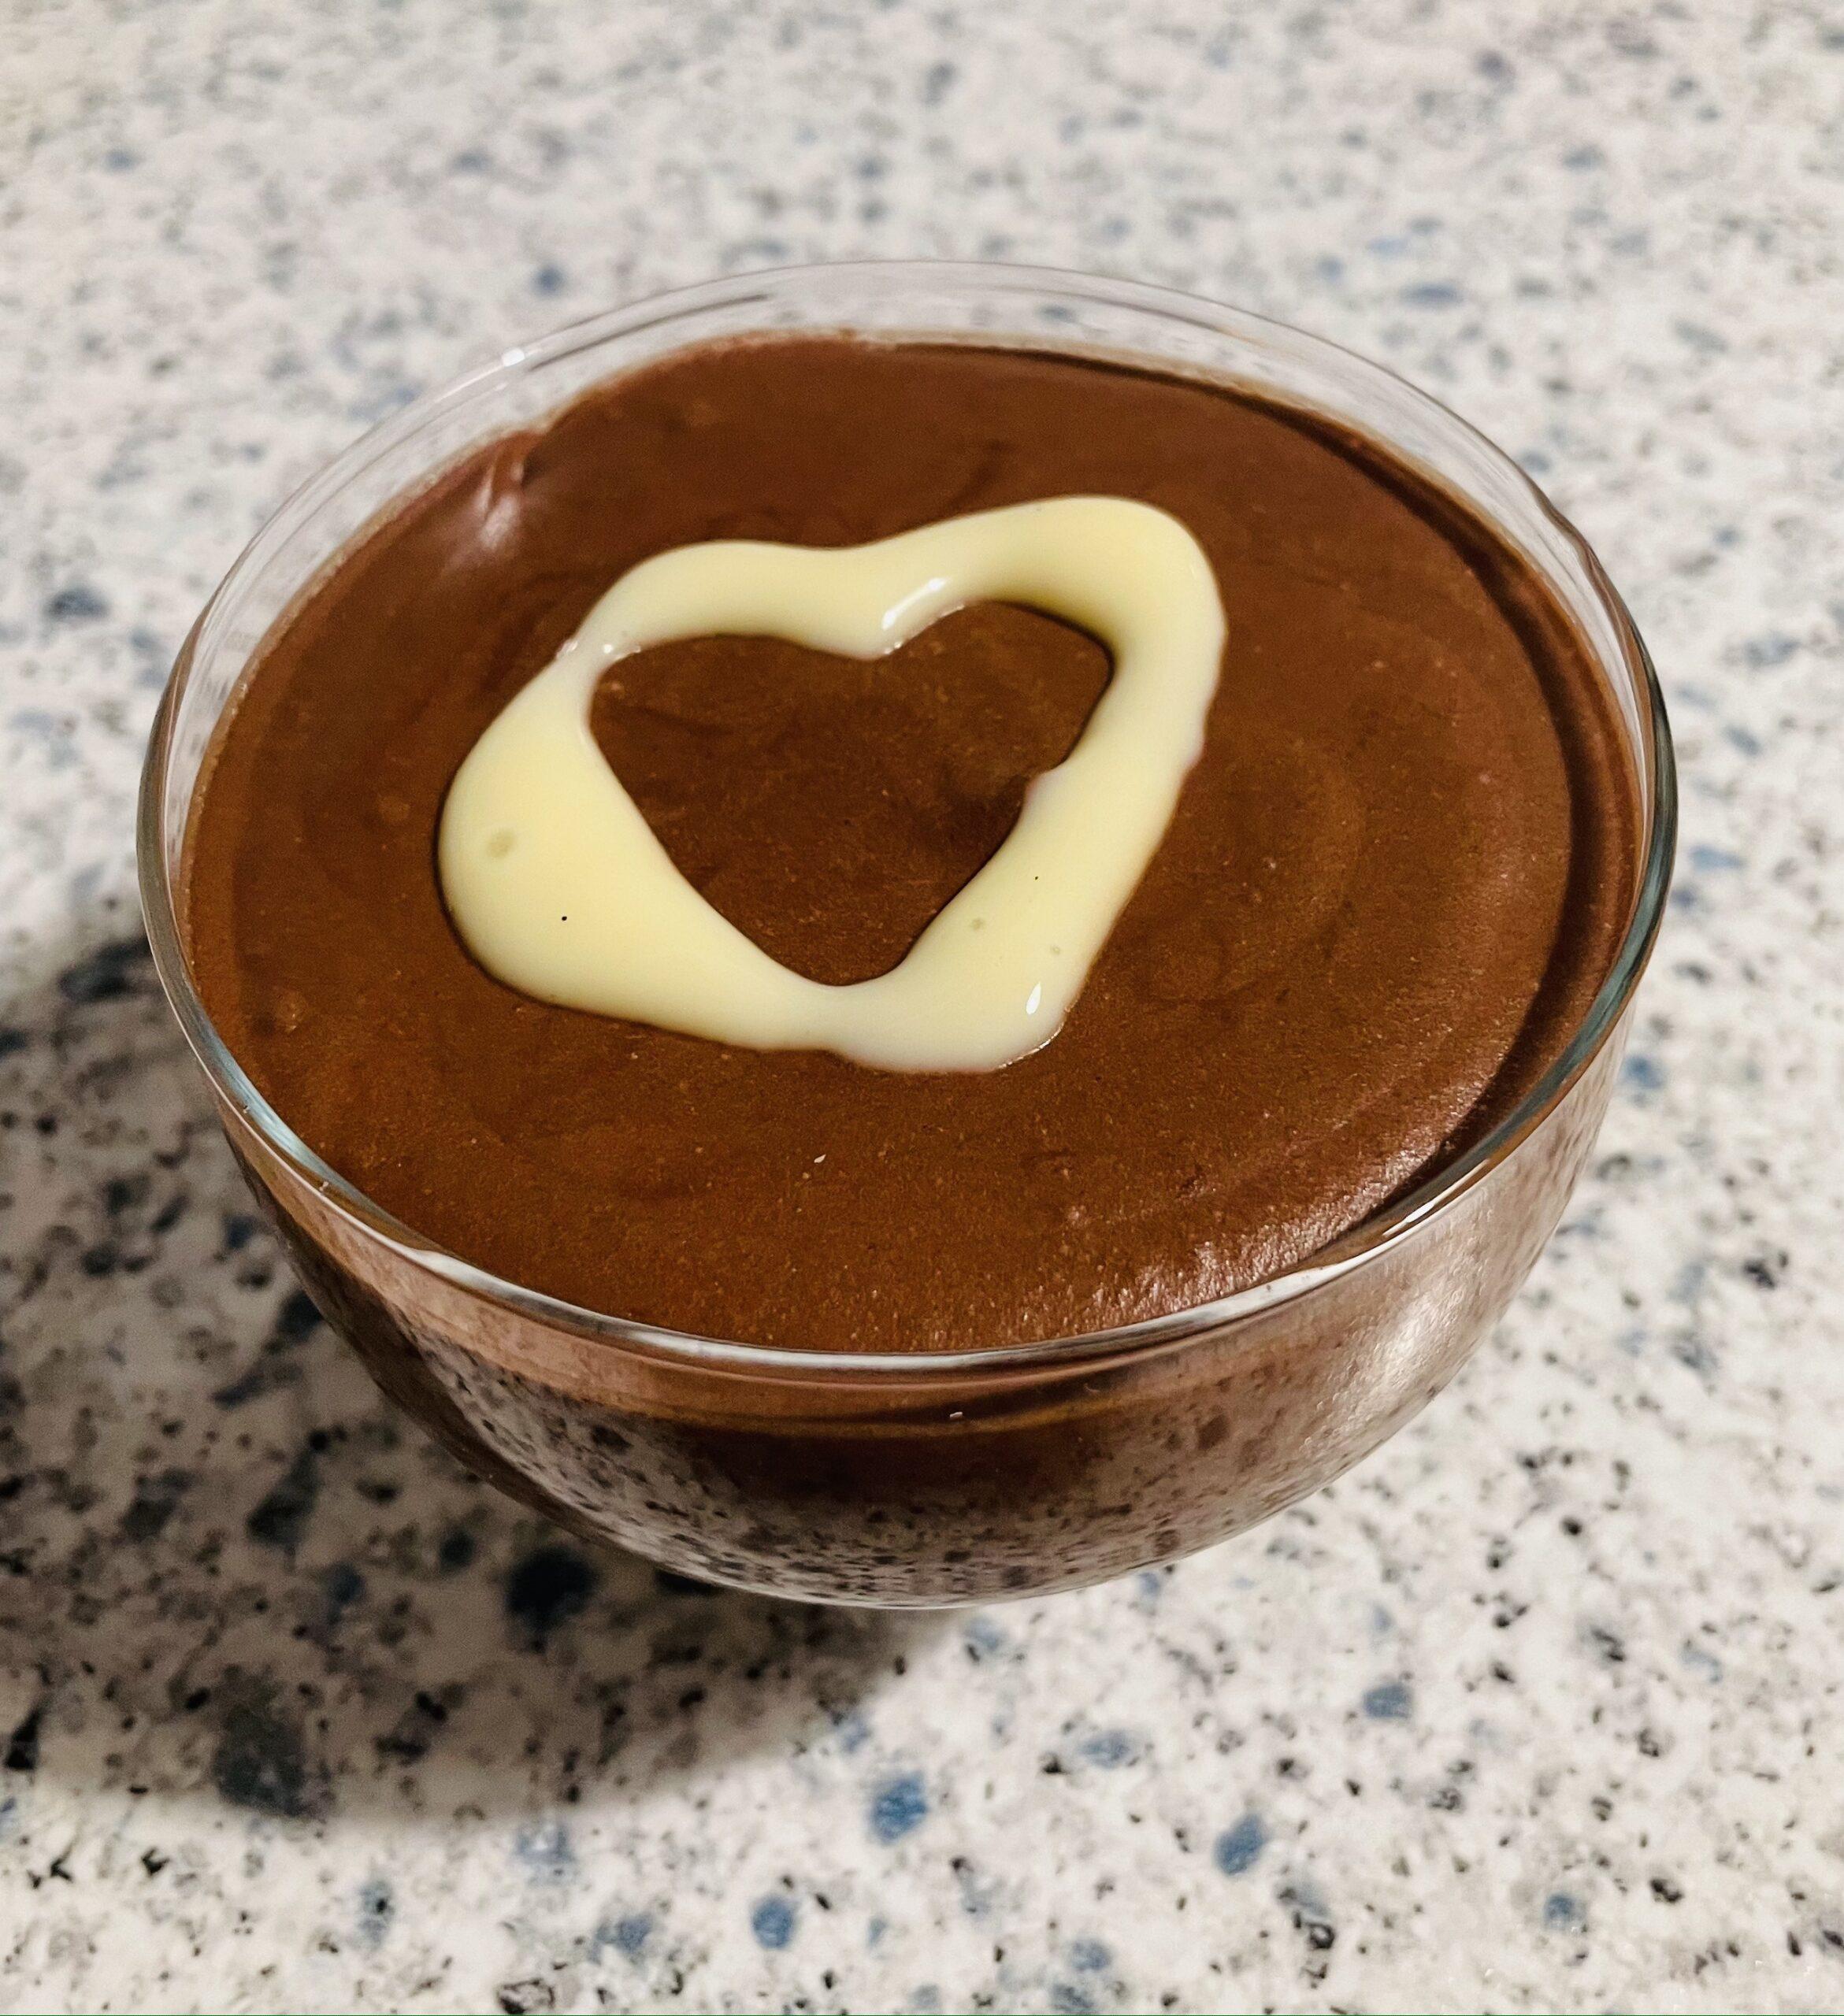 Dunkle Mousse au Chocolat